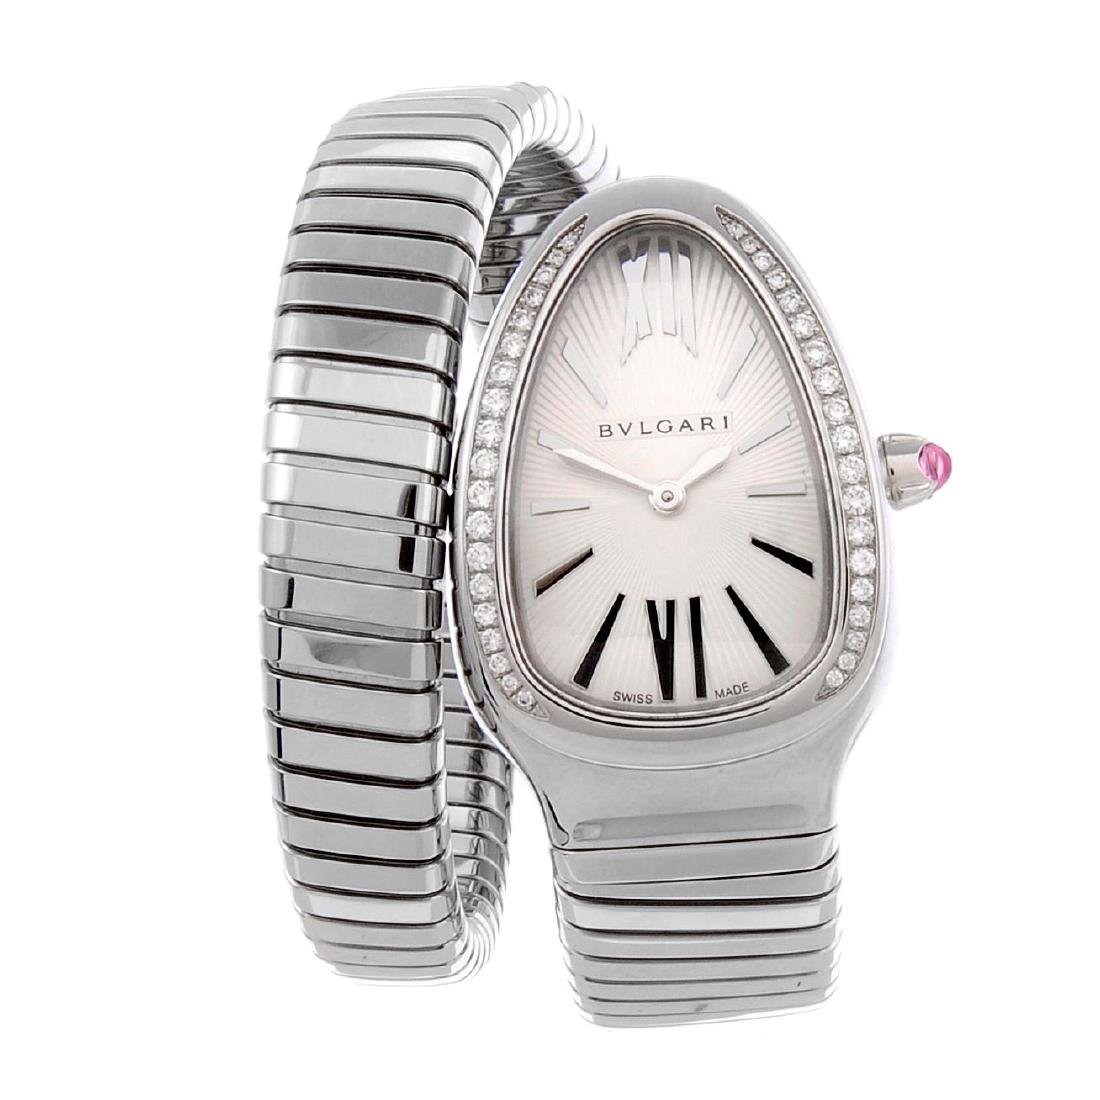 BULGARI - a lady's Serpenti Tubogas bracelet watch.